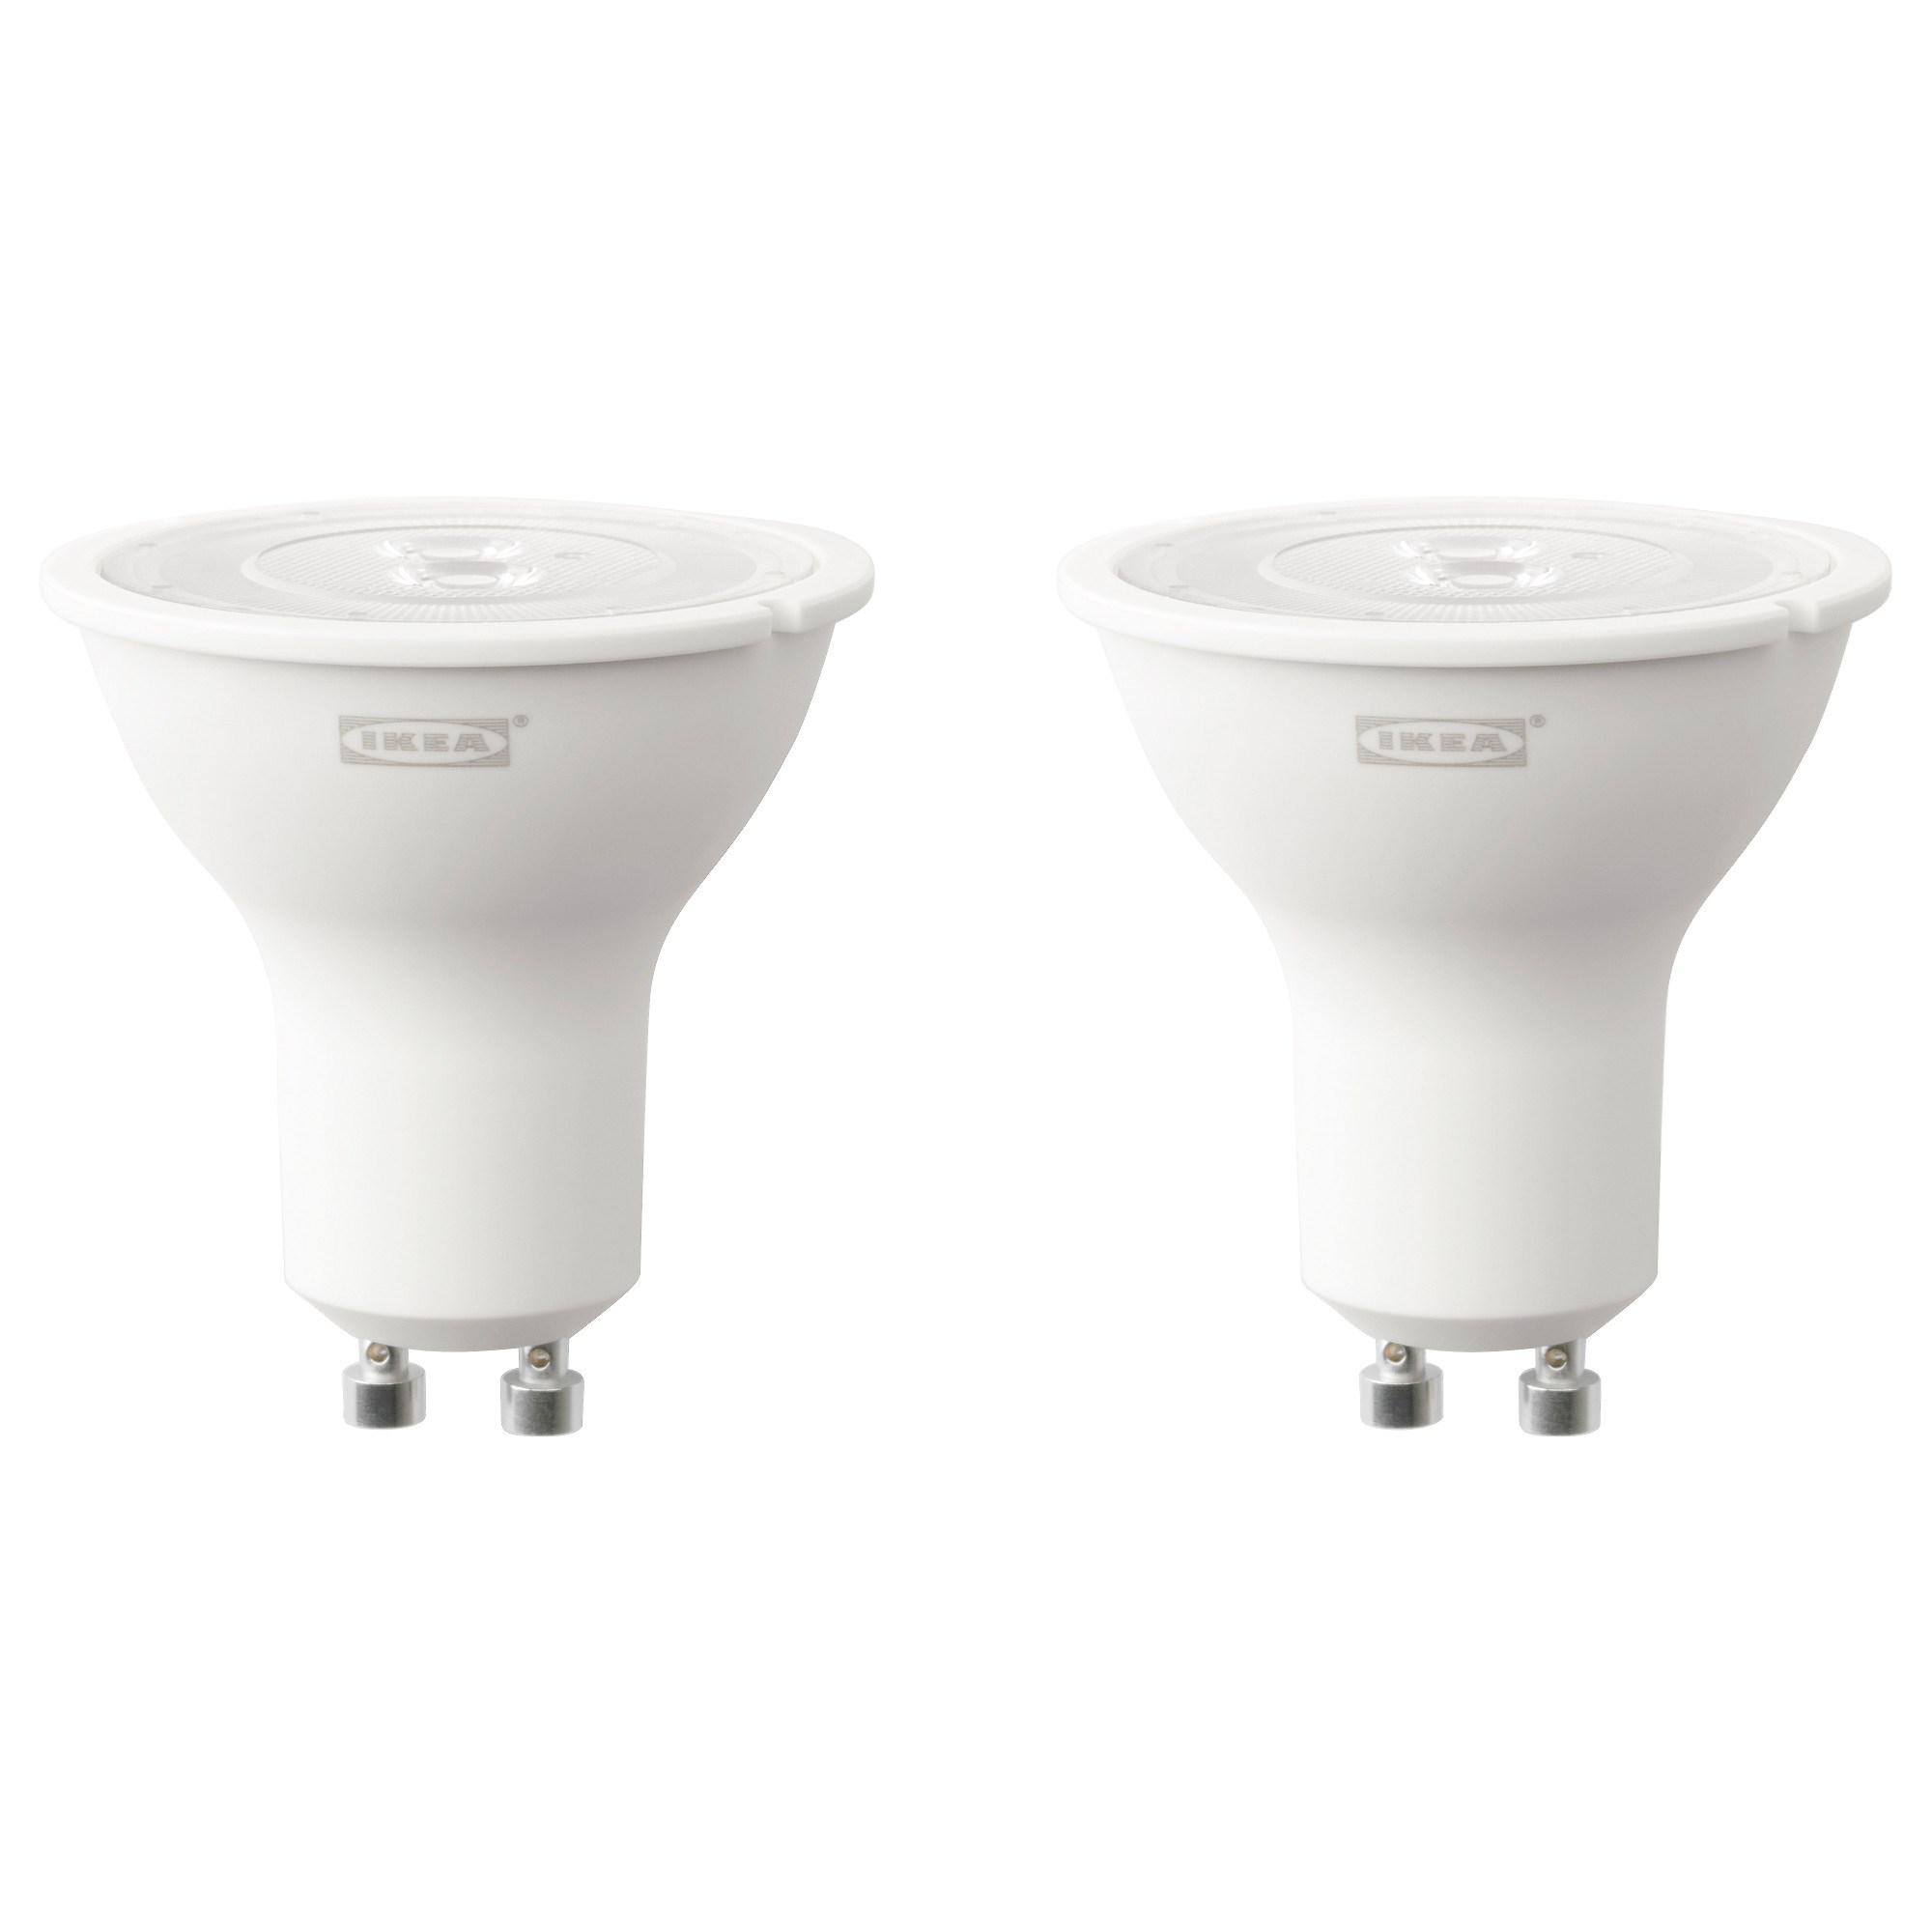 Ryet Led Bulb Gu10 Light Colour Warm White 2700 Kelvin 200 Lm